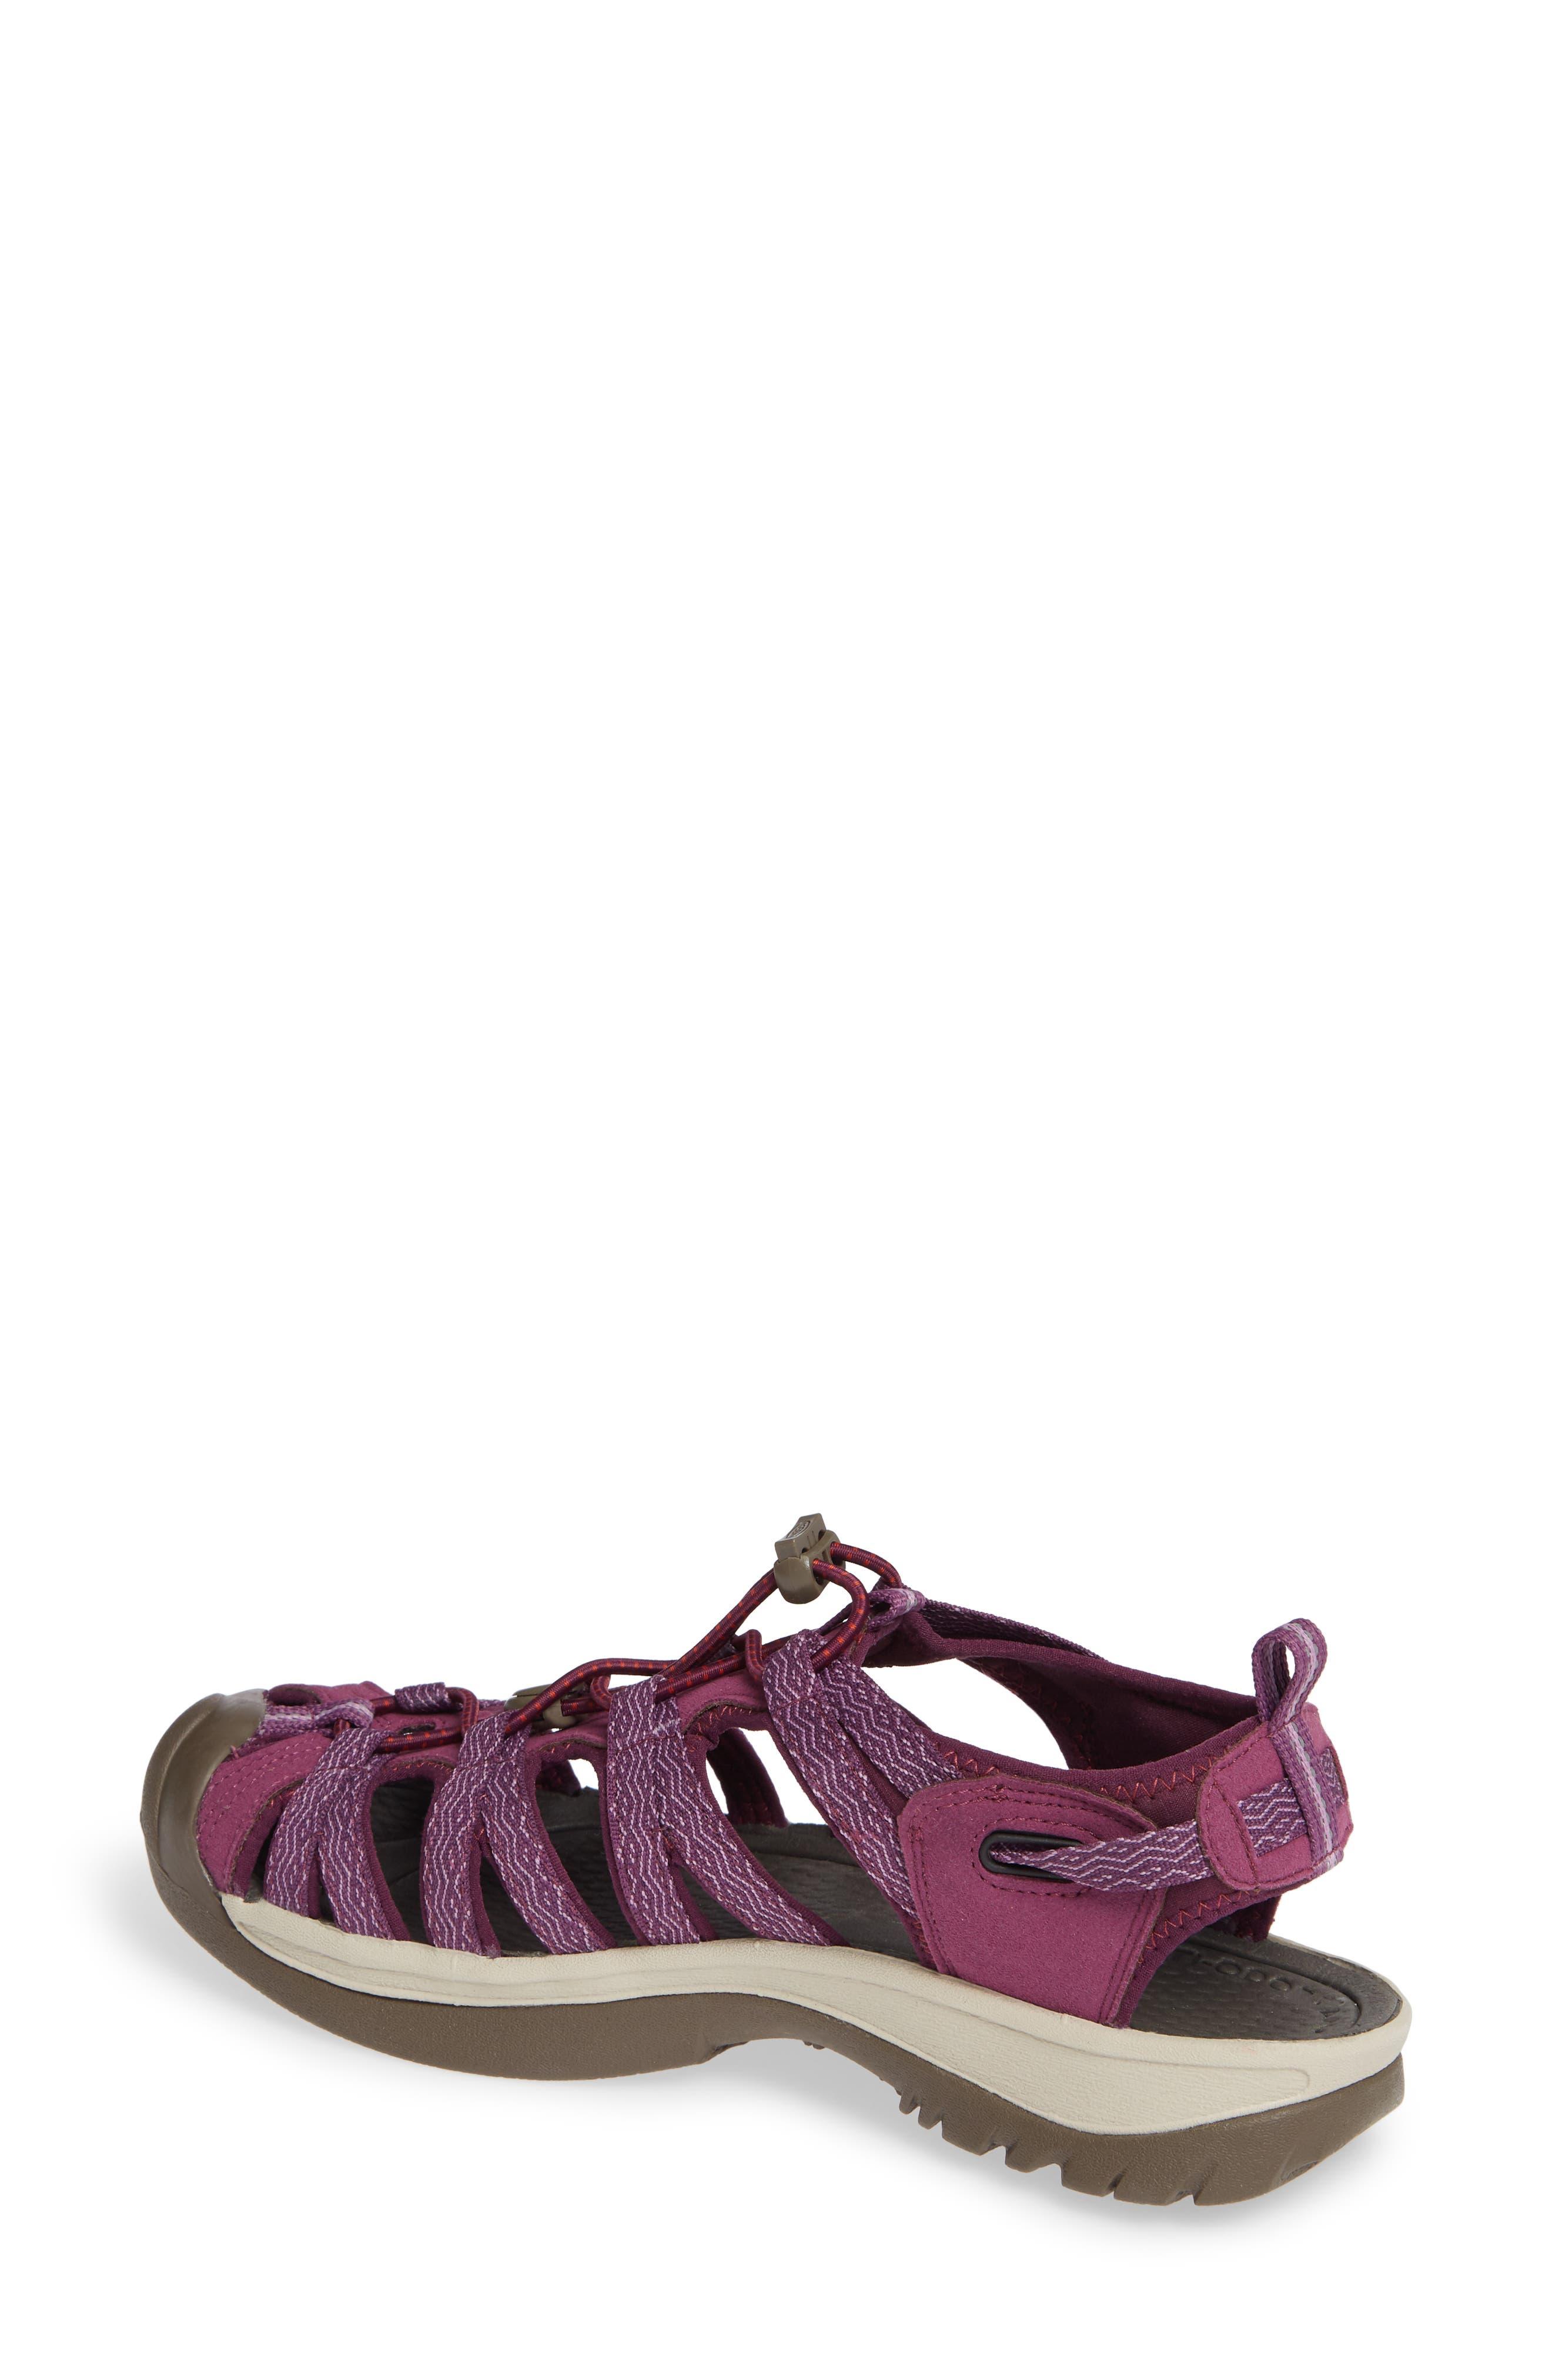 'Whisper' Water Friendly Sport Sandal,                             Alternate thumbnail 2, color,                             Grape Kiss/ Grape Wine